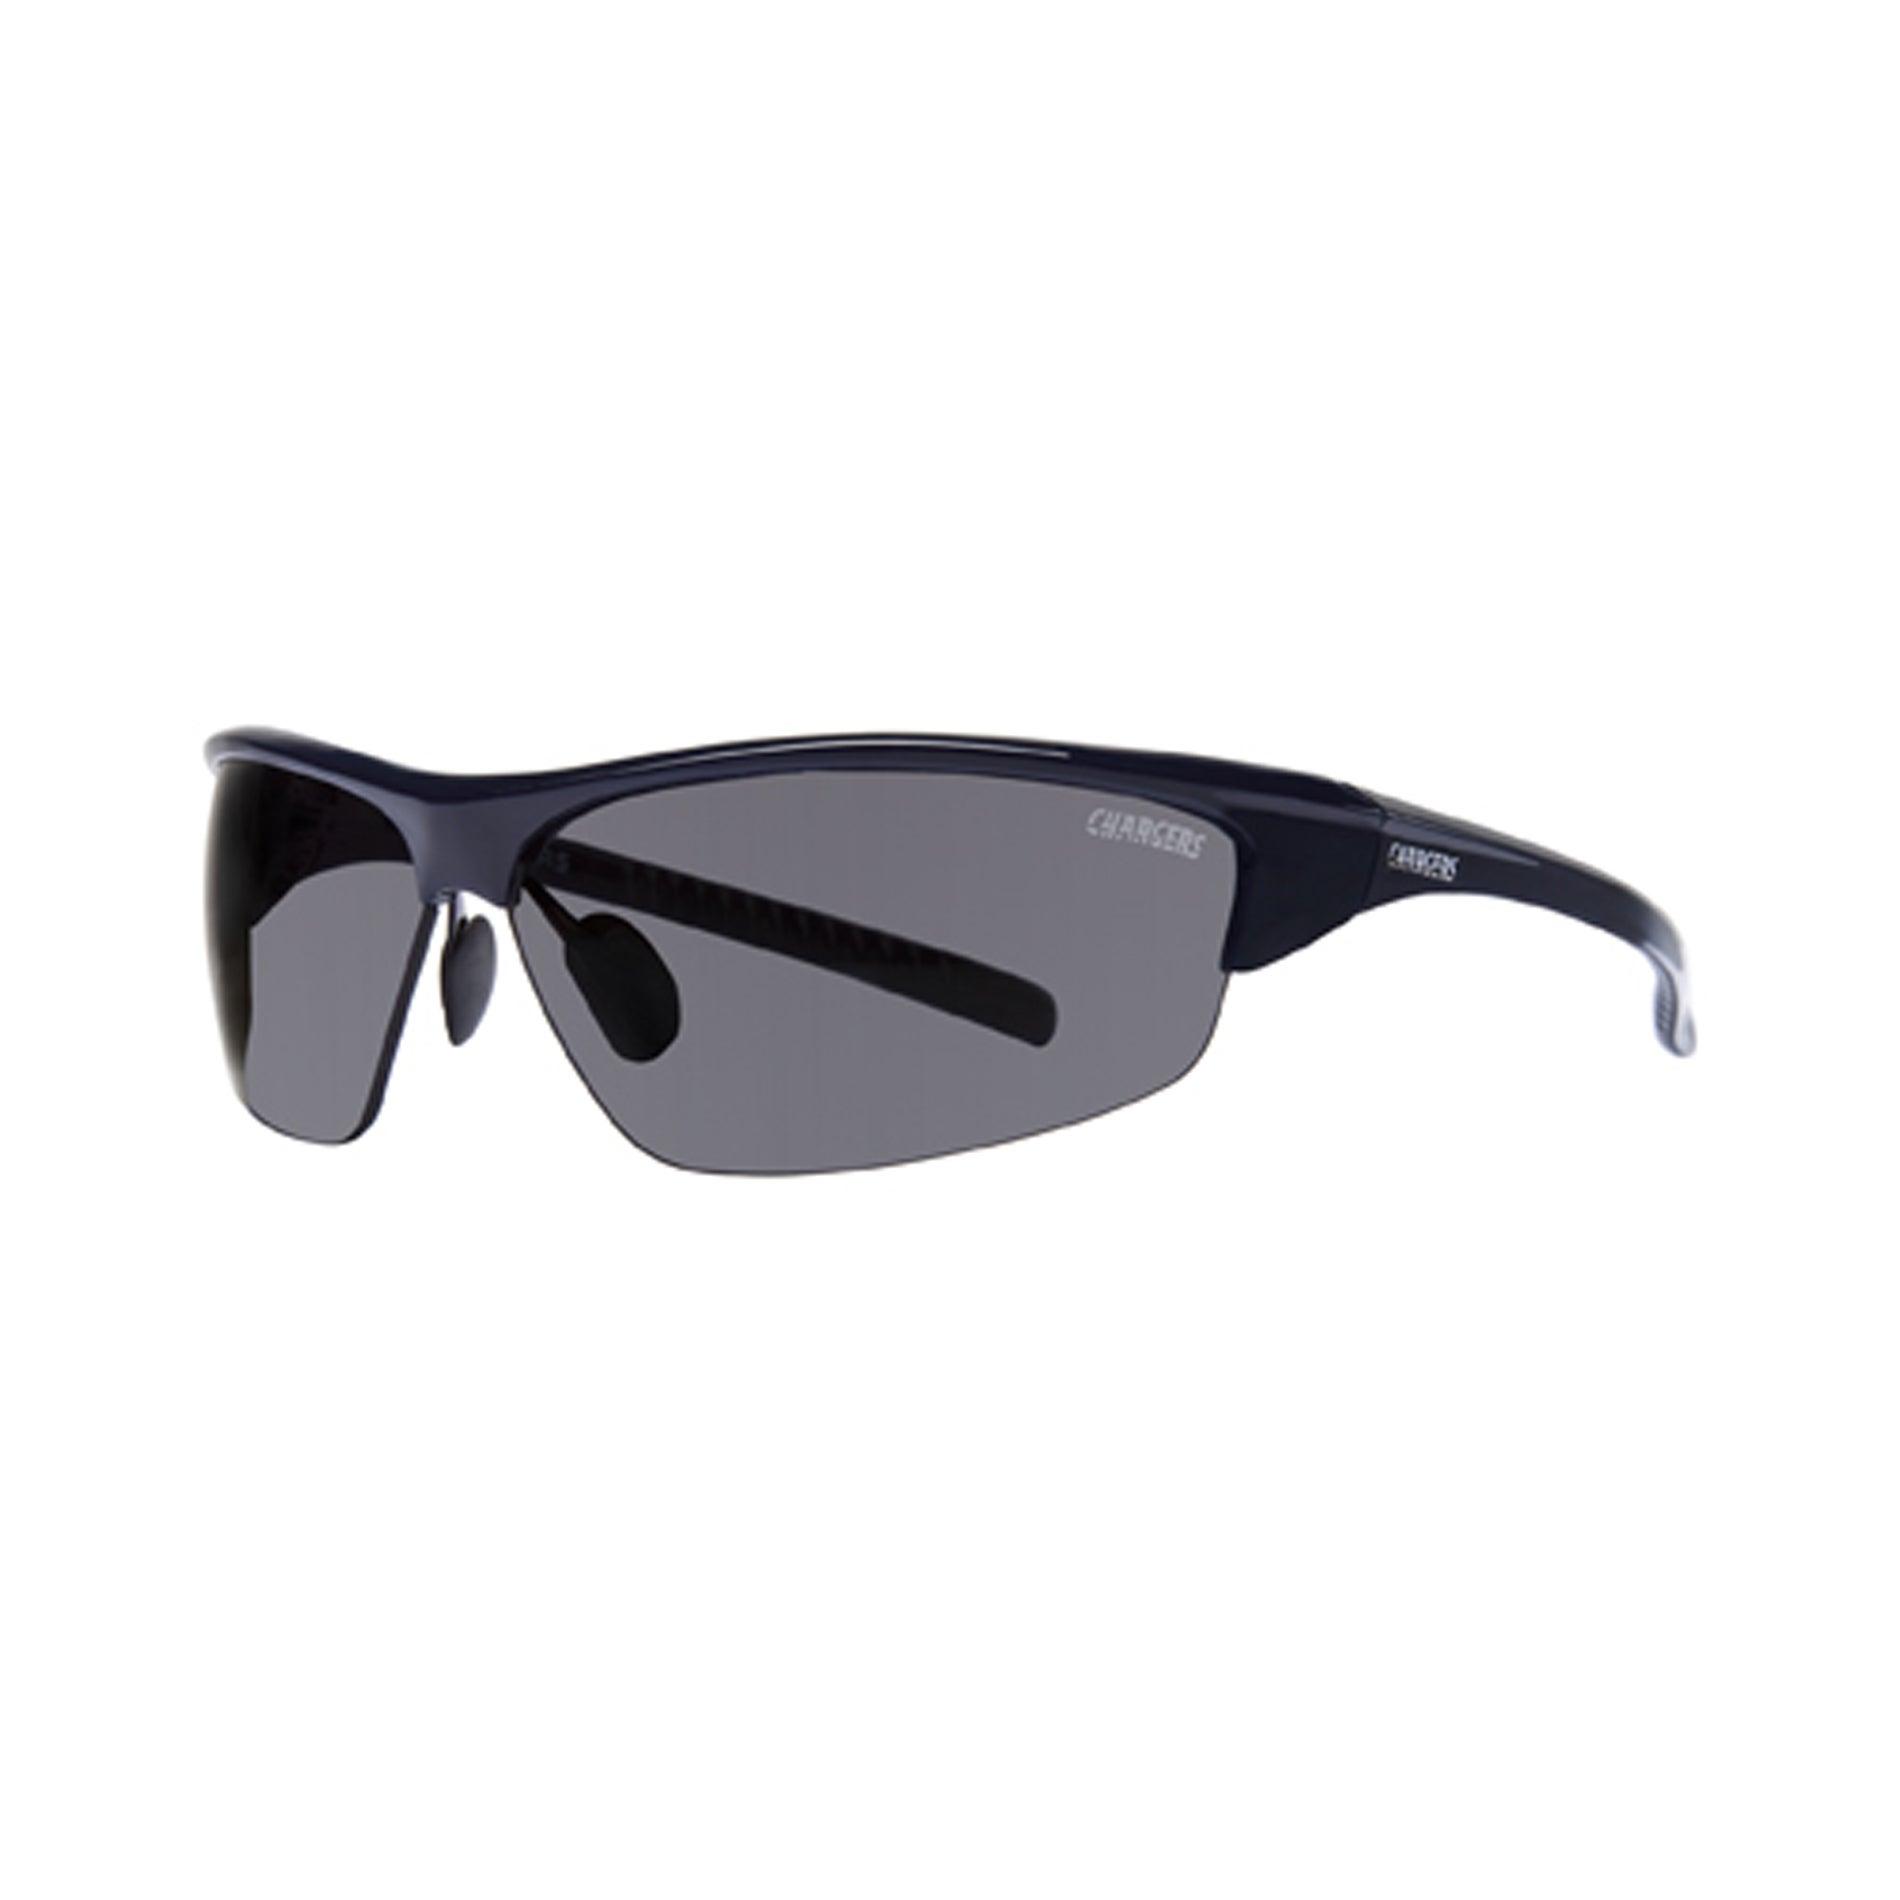 Modo San Diego Chargers Men's 'Impact' Sunglasses